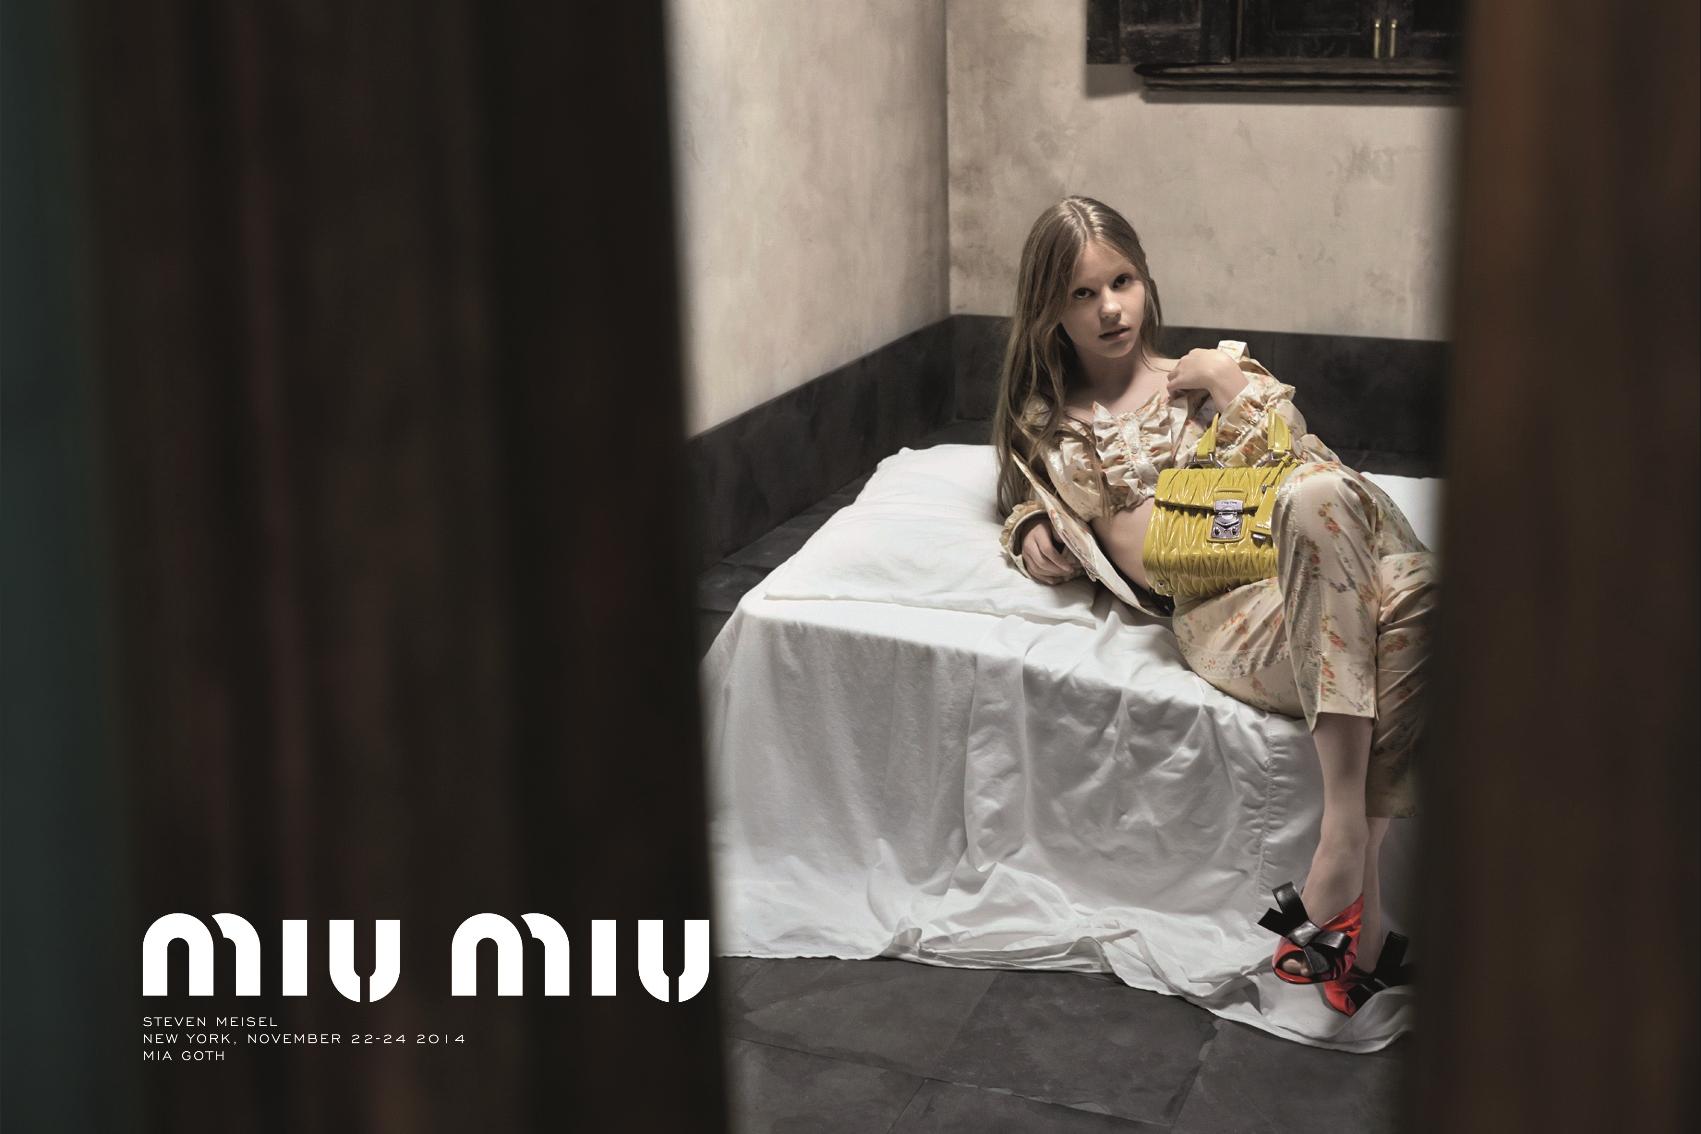 Miu Miu Spring Summer 2015 Adv. Campaign_02.jpg